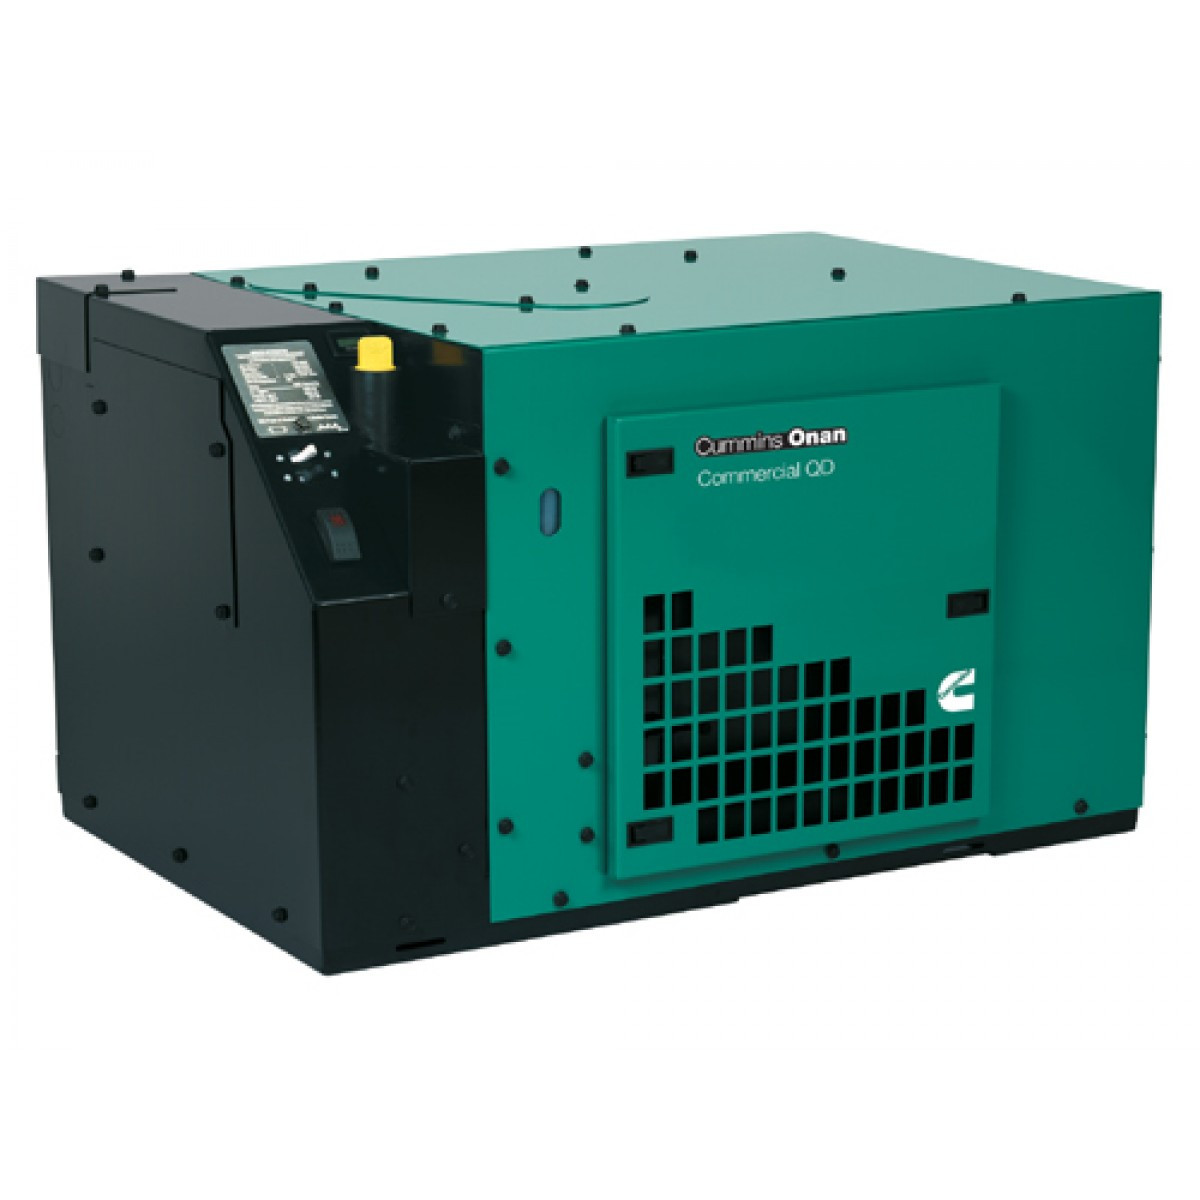 Cummins Onan Commercial Series Qd5000 5kw Diesel Mobile Generator  120 Volt Only